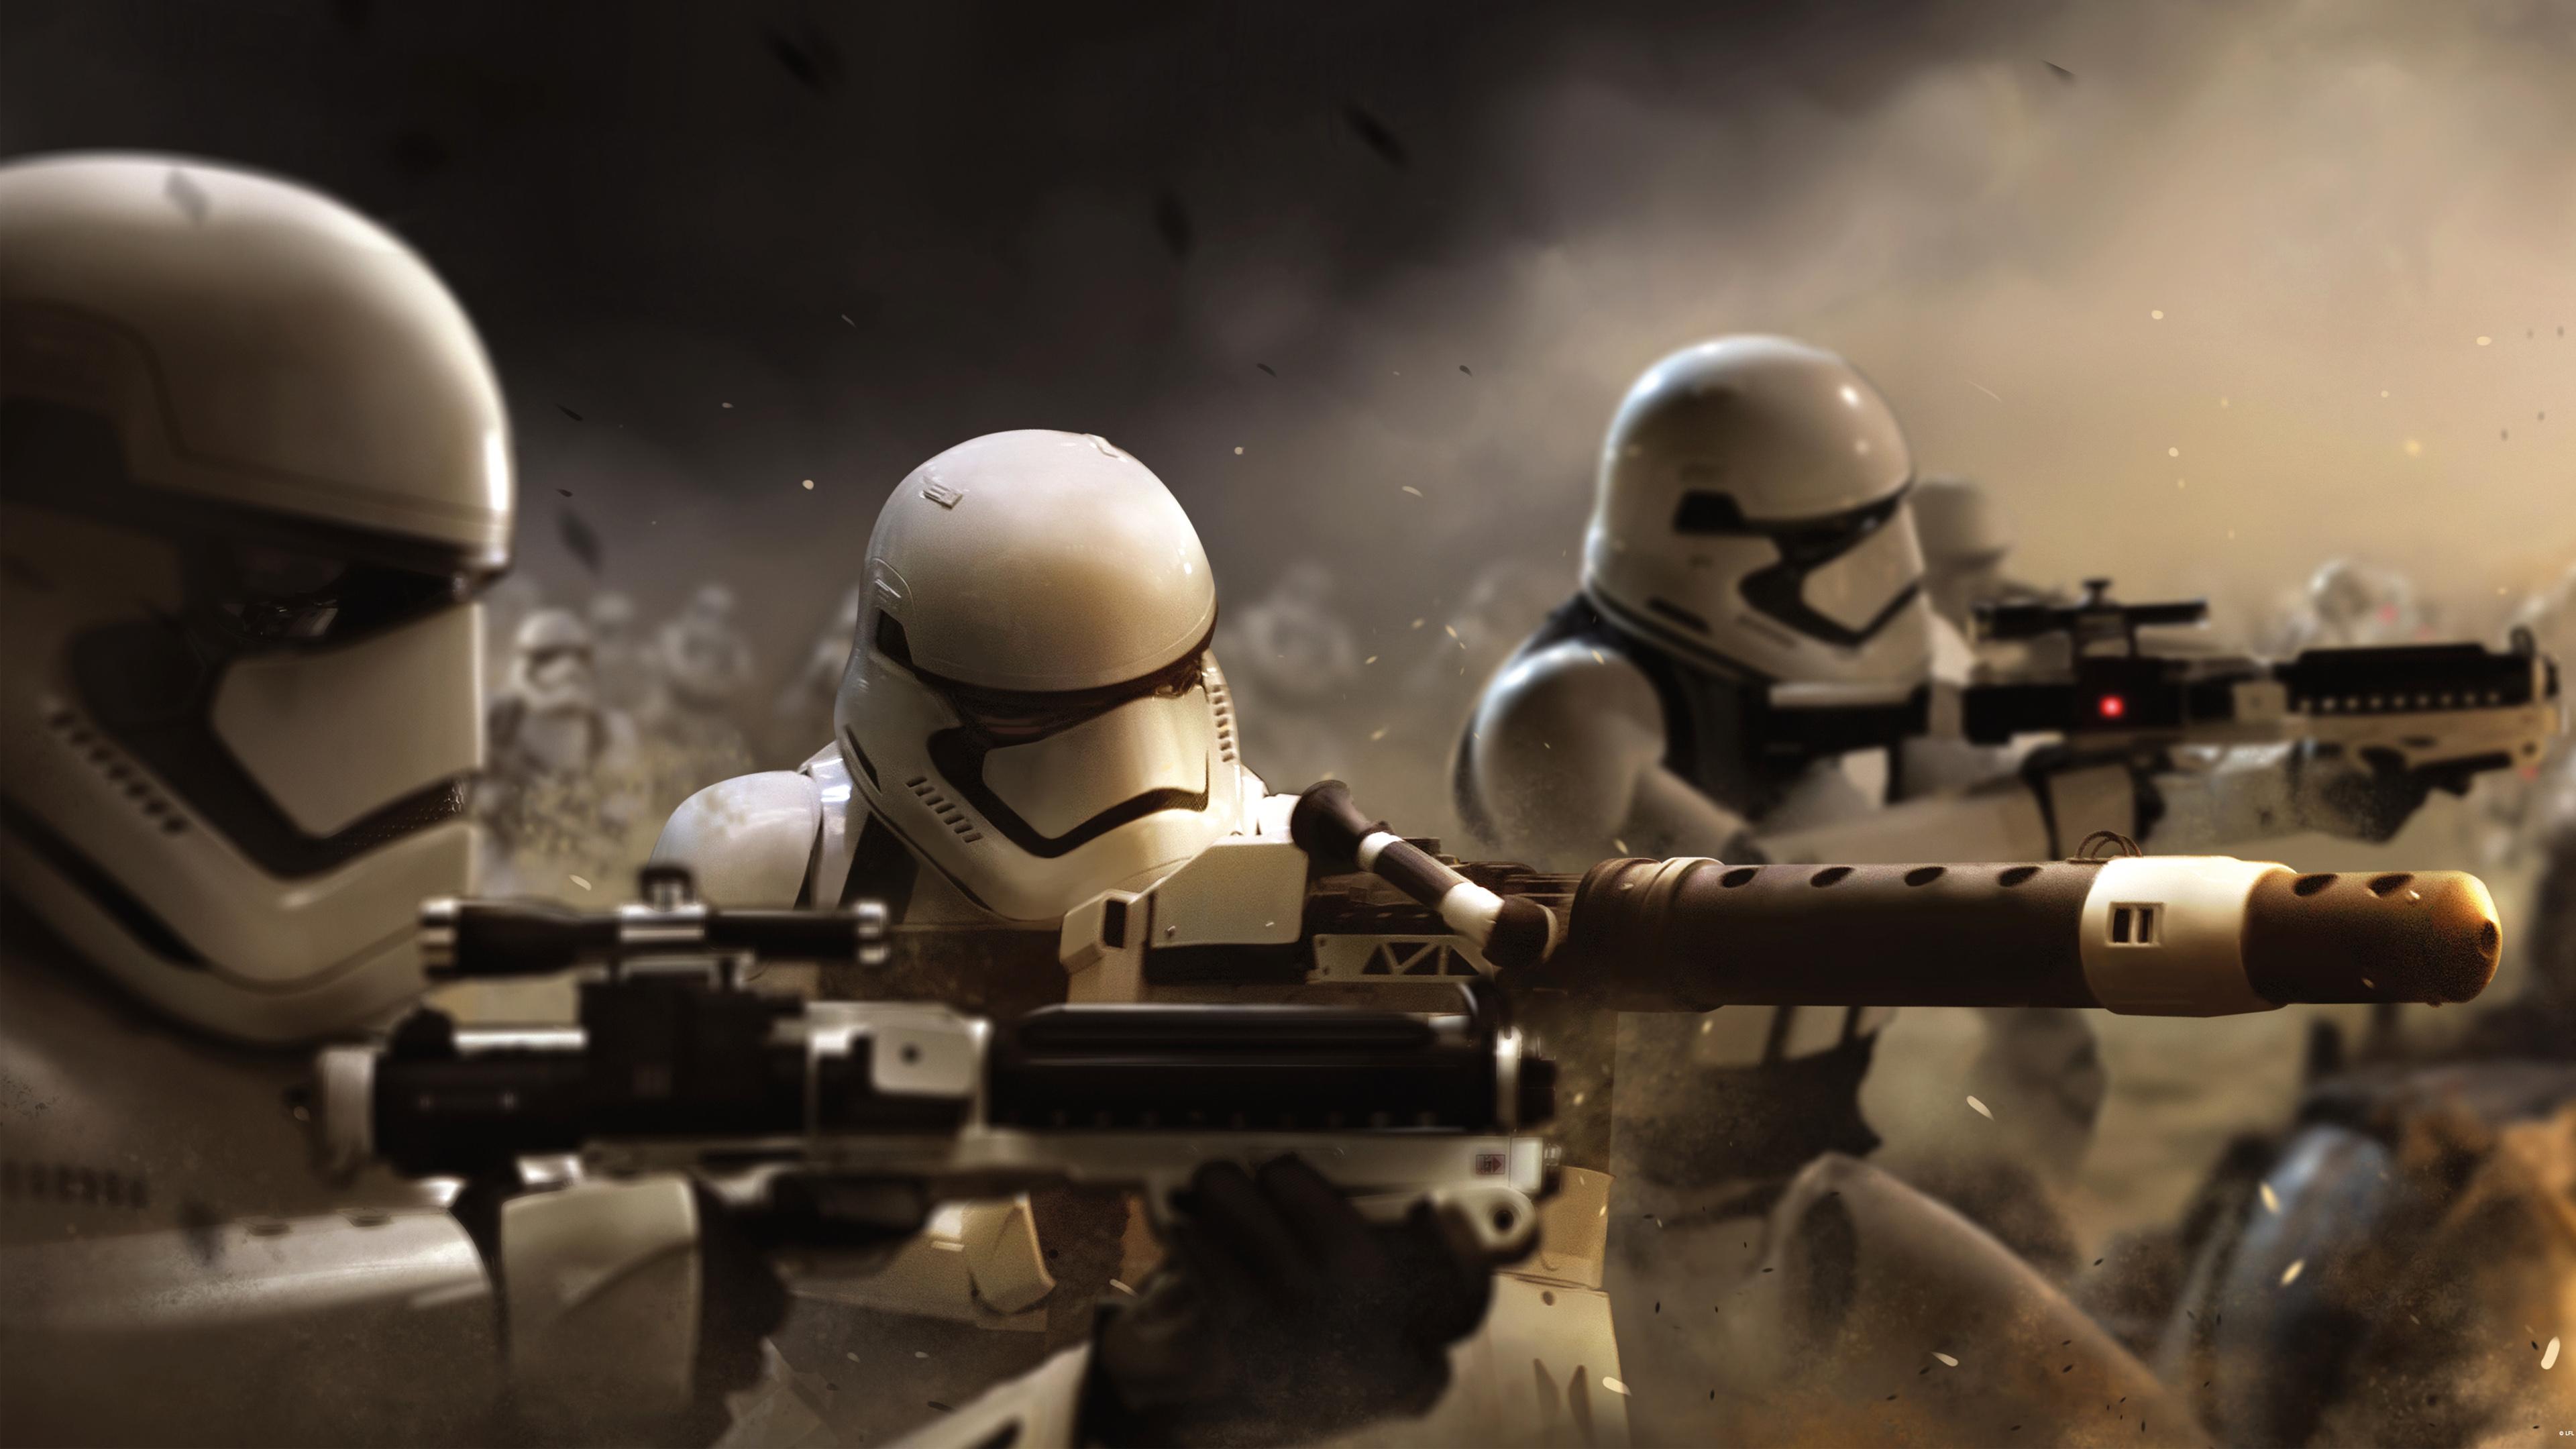 47+ Star Wars 4K Wallpaper on WallpaperSafari